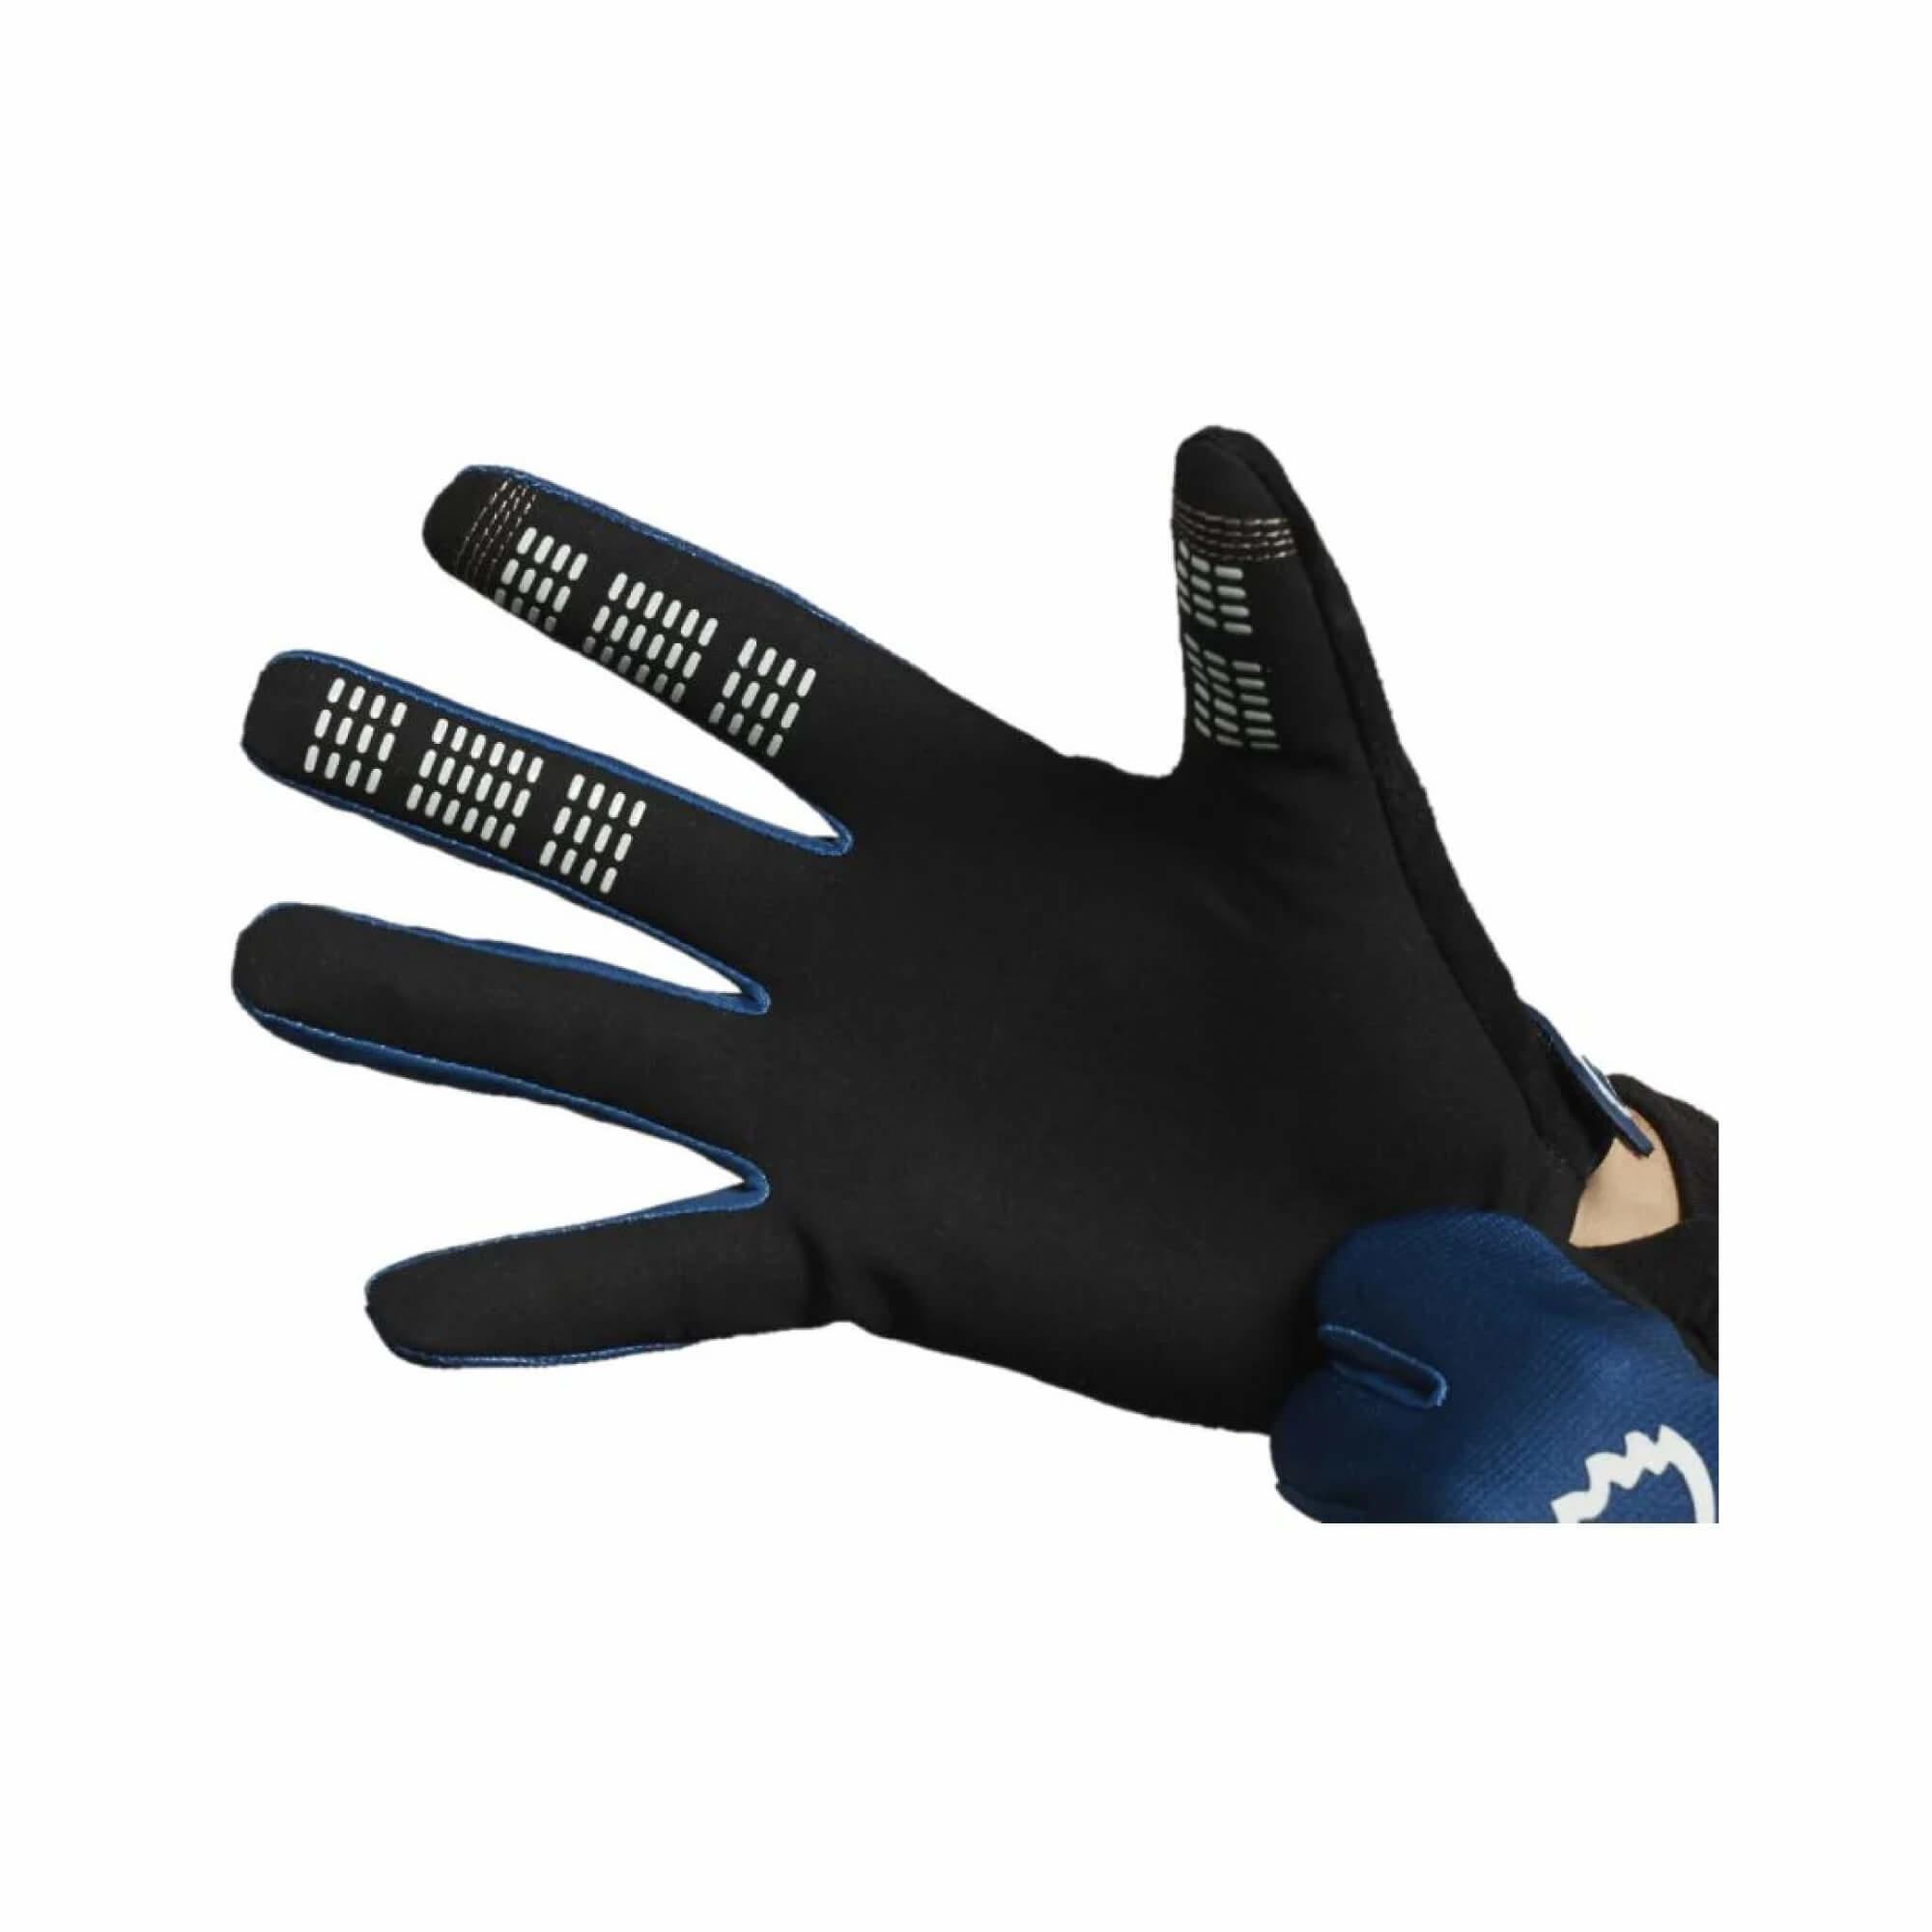 Ranger Glove 2021-6